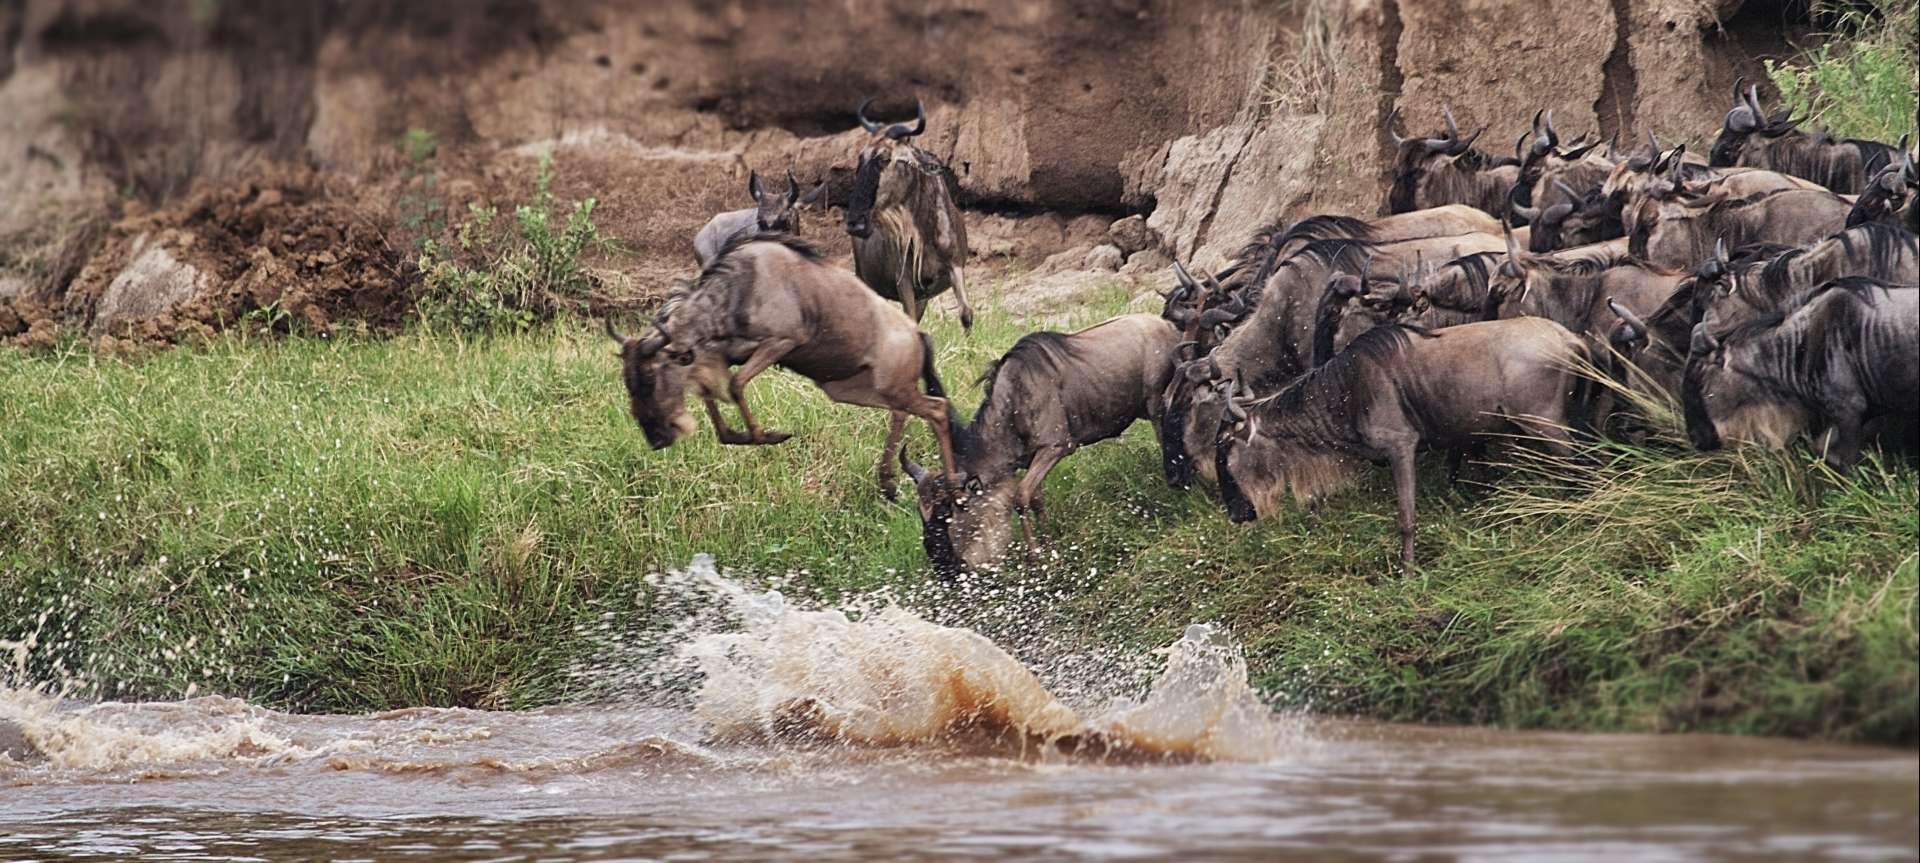 Serengeti National Park - Africa Wildlife Safaris